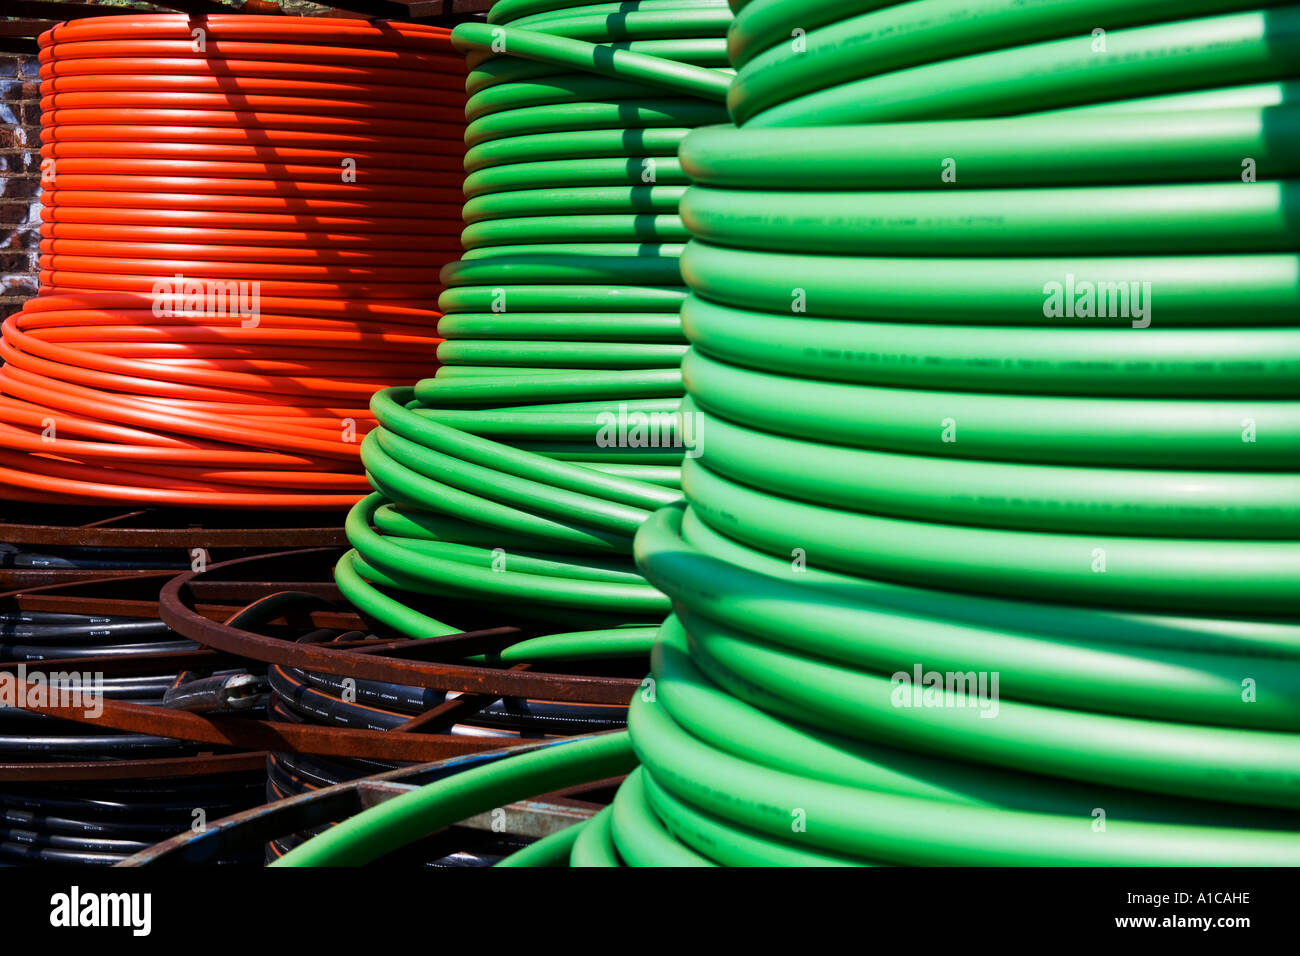 Schön Roter Draht Webstuhl Fotos - Elektrische Schaltplan-Ideen ...